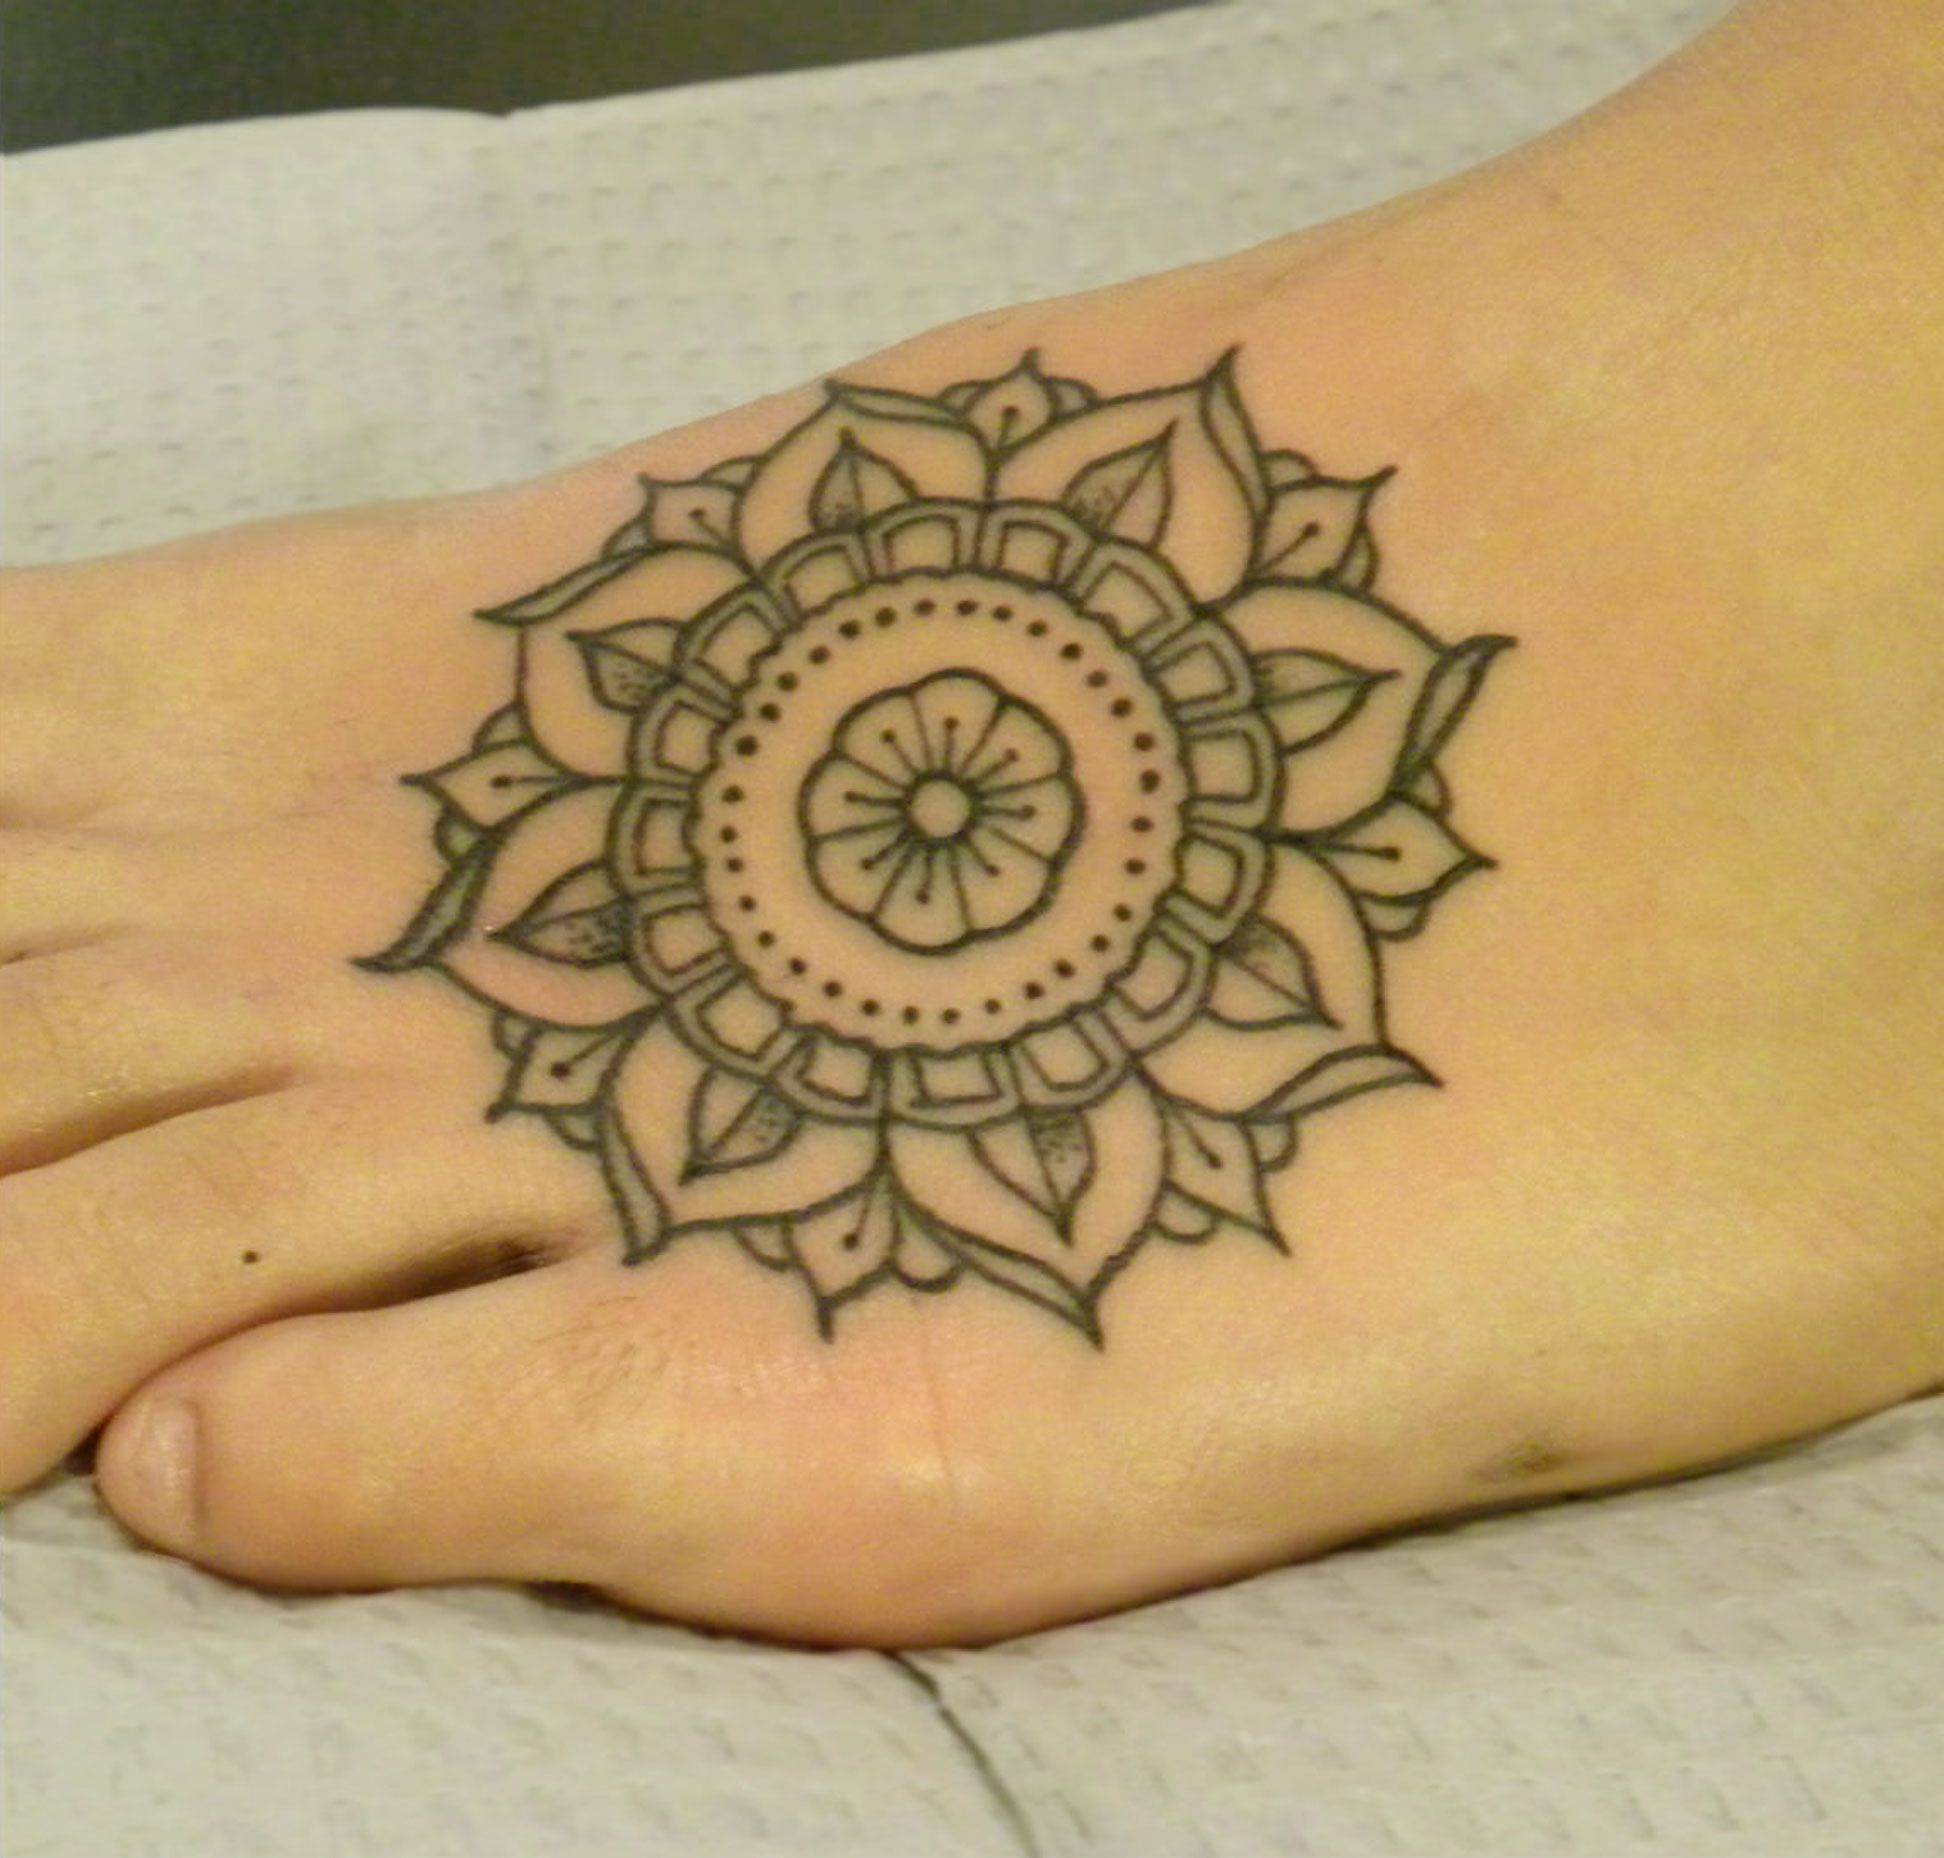 beautiful-mandala-feet-tattoo-idea-1417536304.jpg (JPEG Image, 1944×1858 pixels) - Scaled (32%)